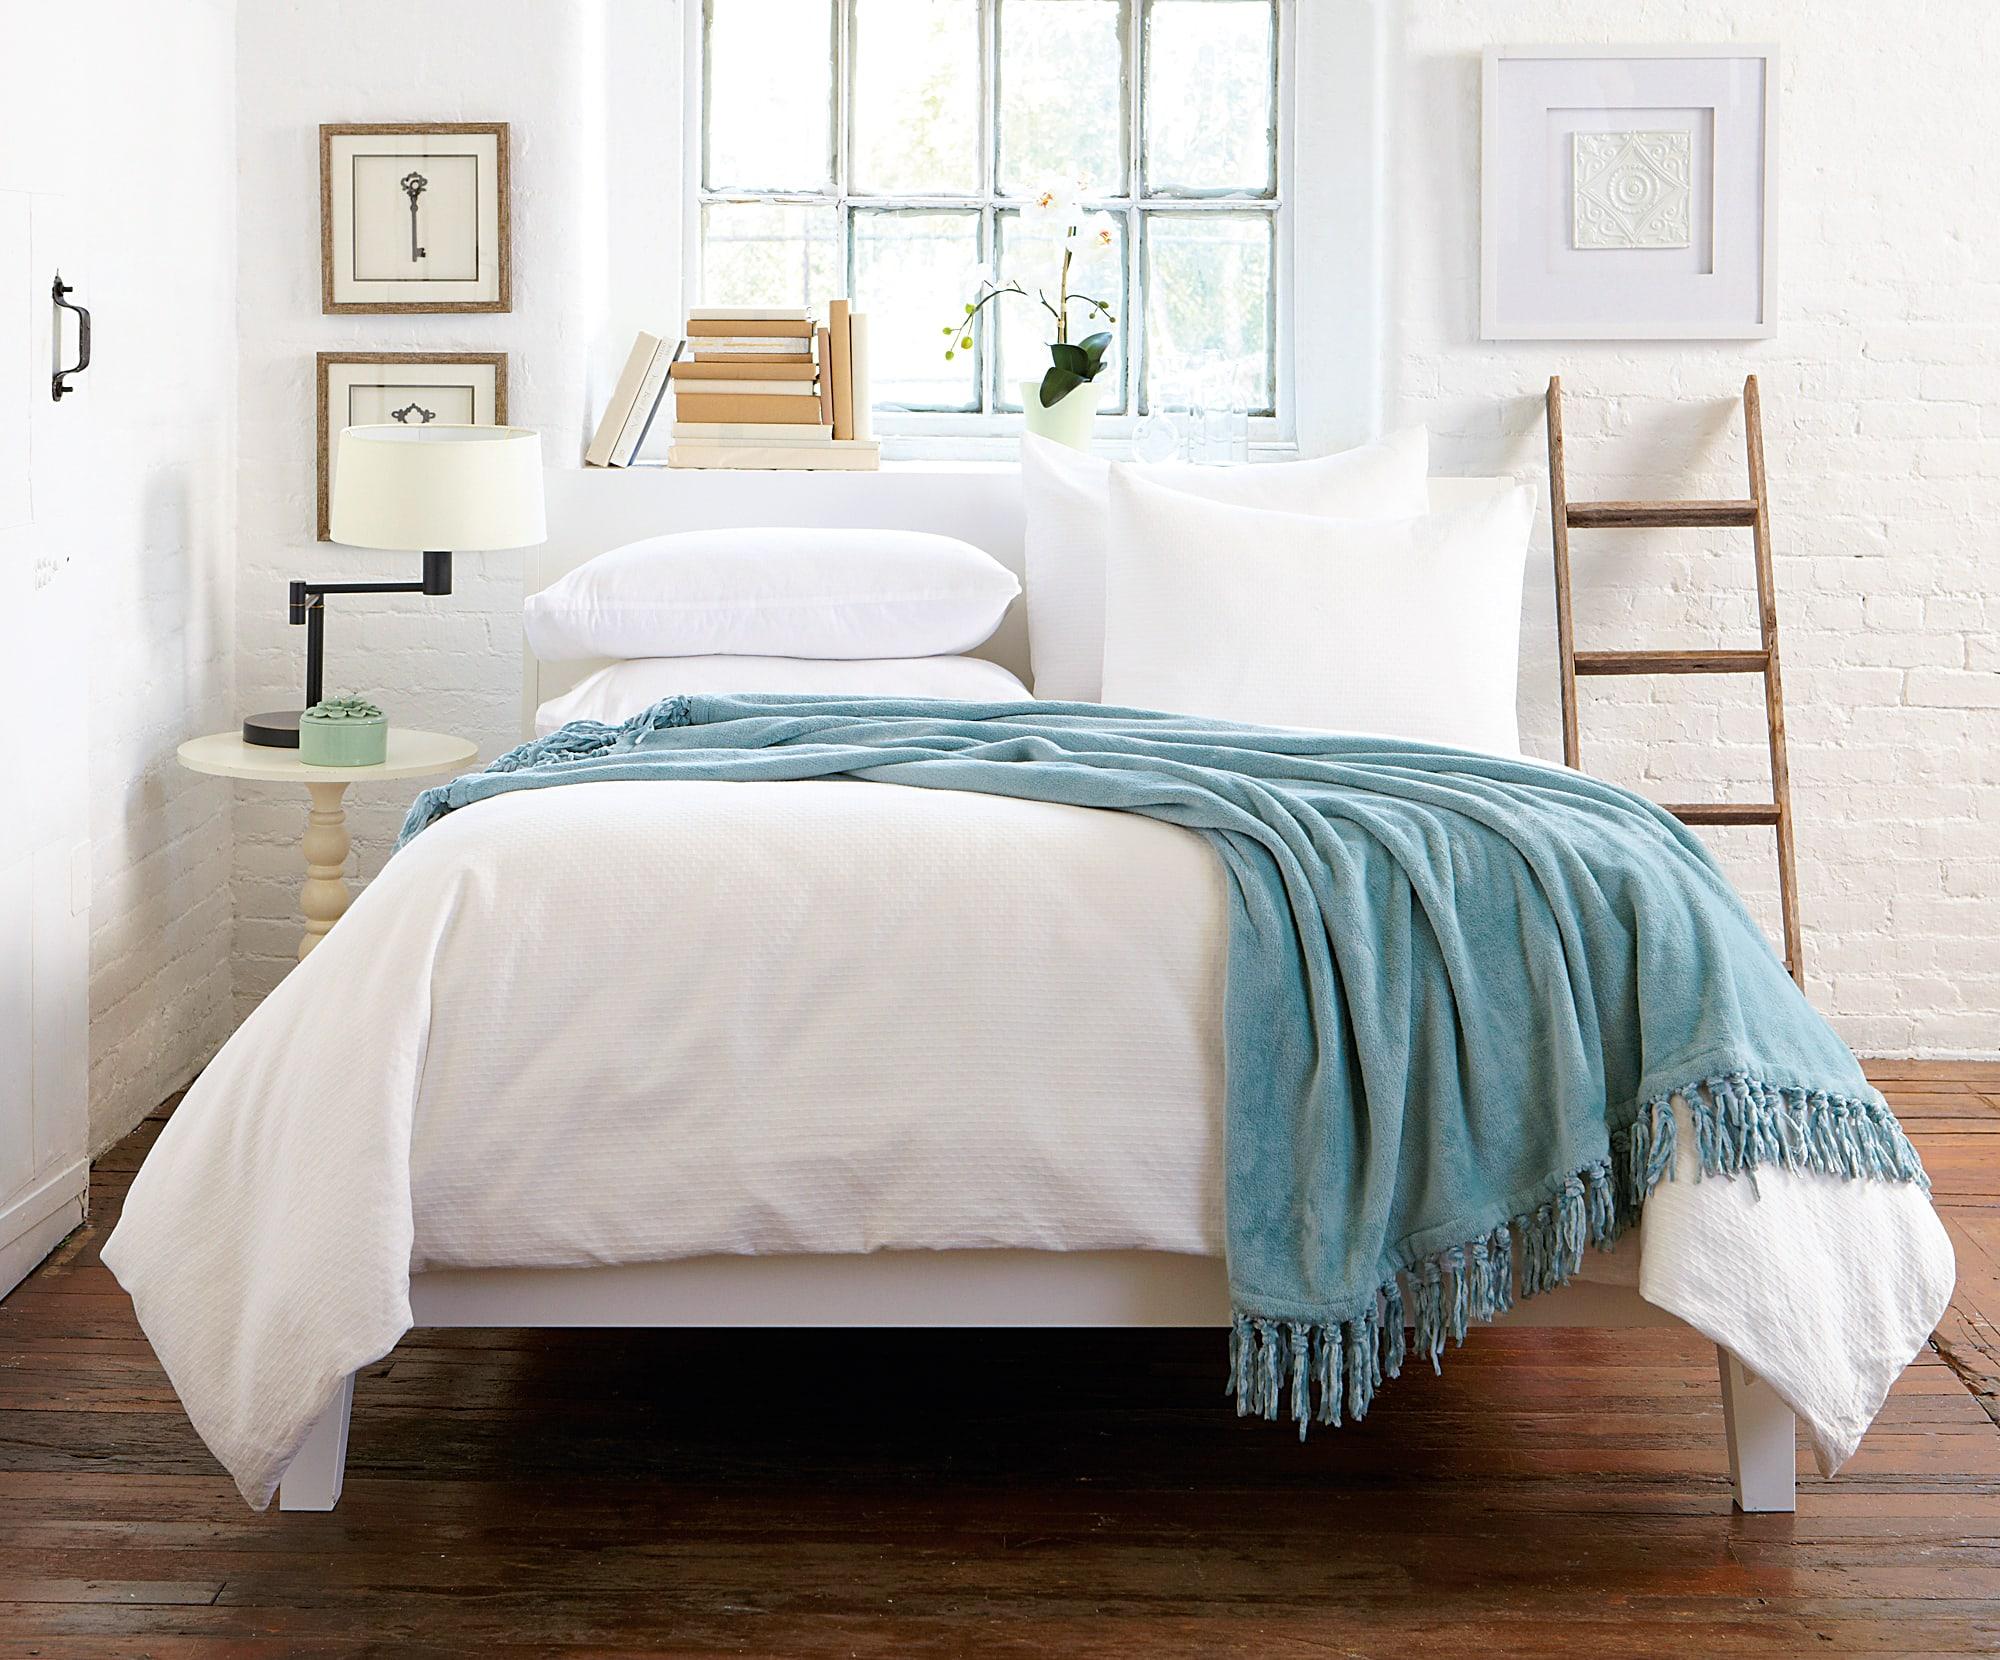 home-fashion-designs-studio141-photoshoot-2017-bedding-raya